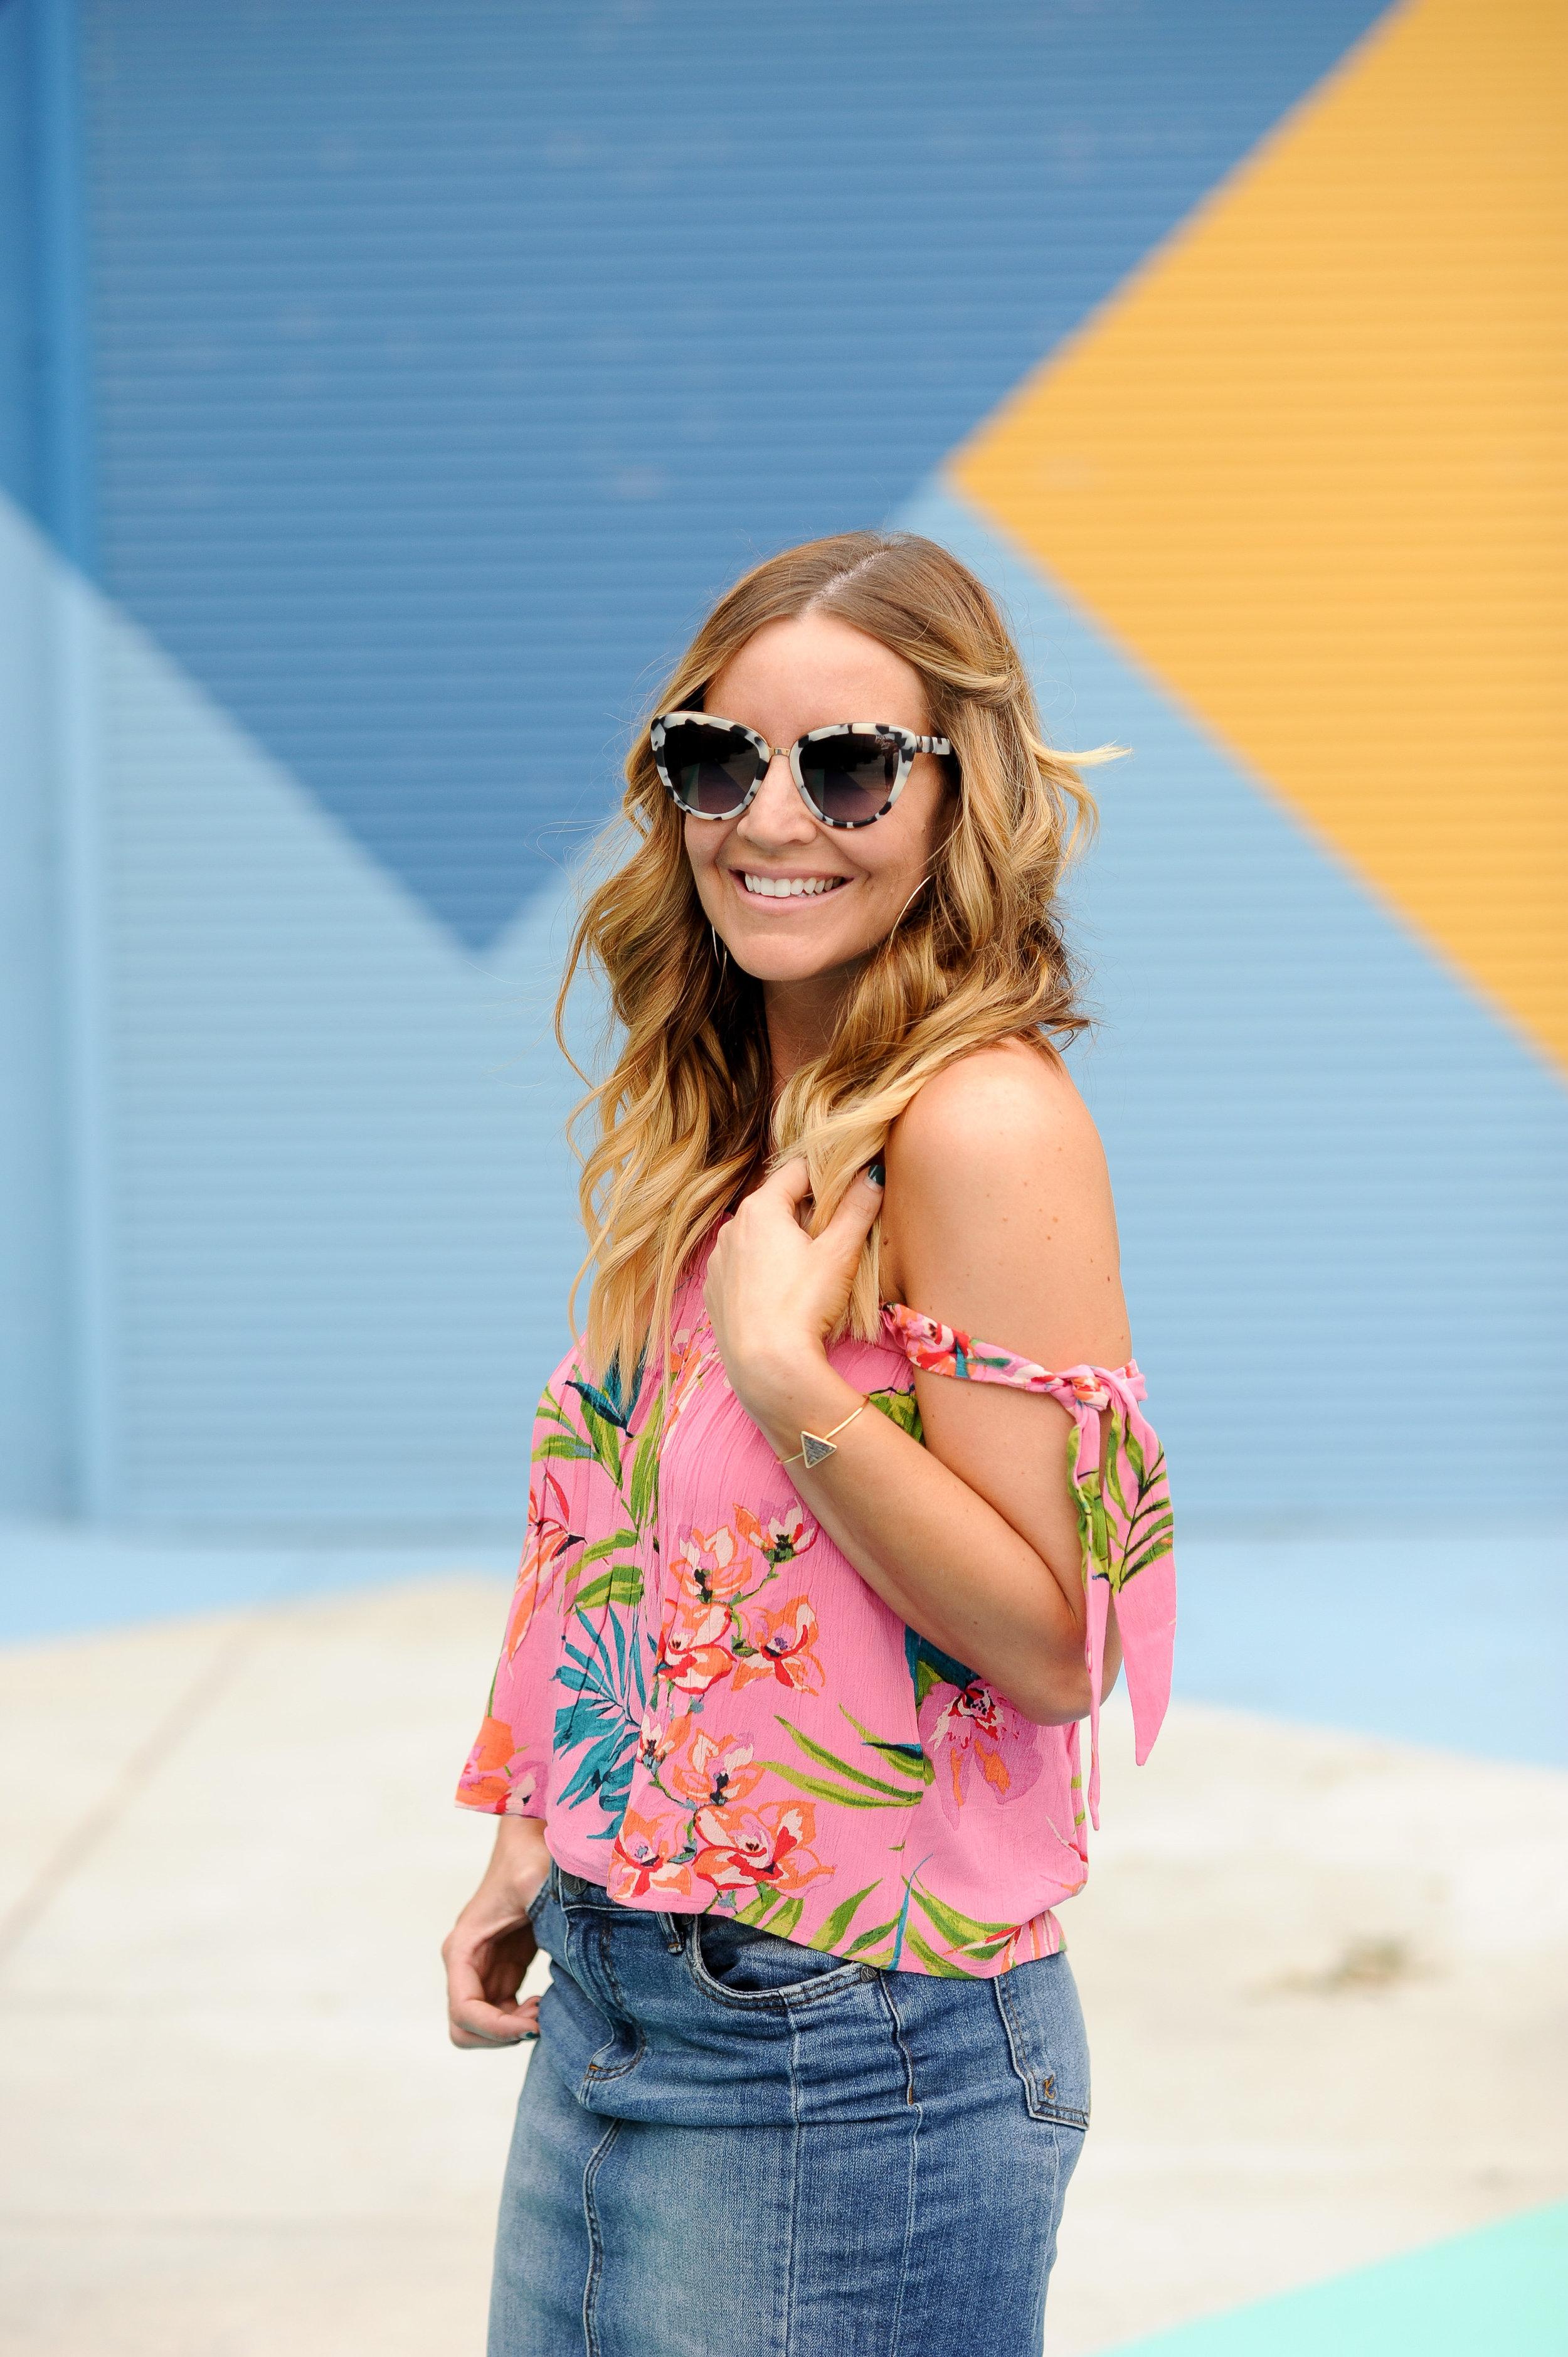 pink shirt 4.jpg